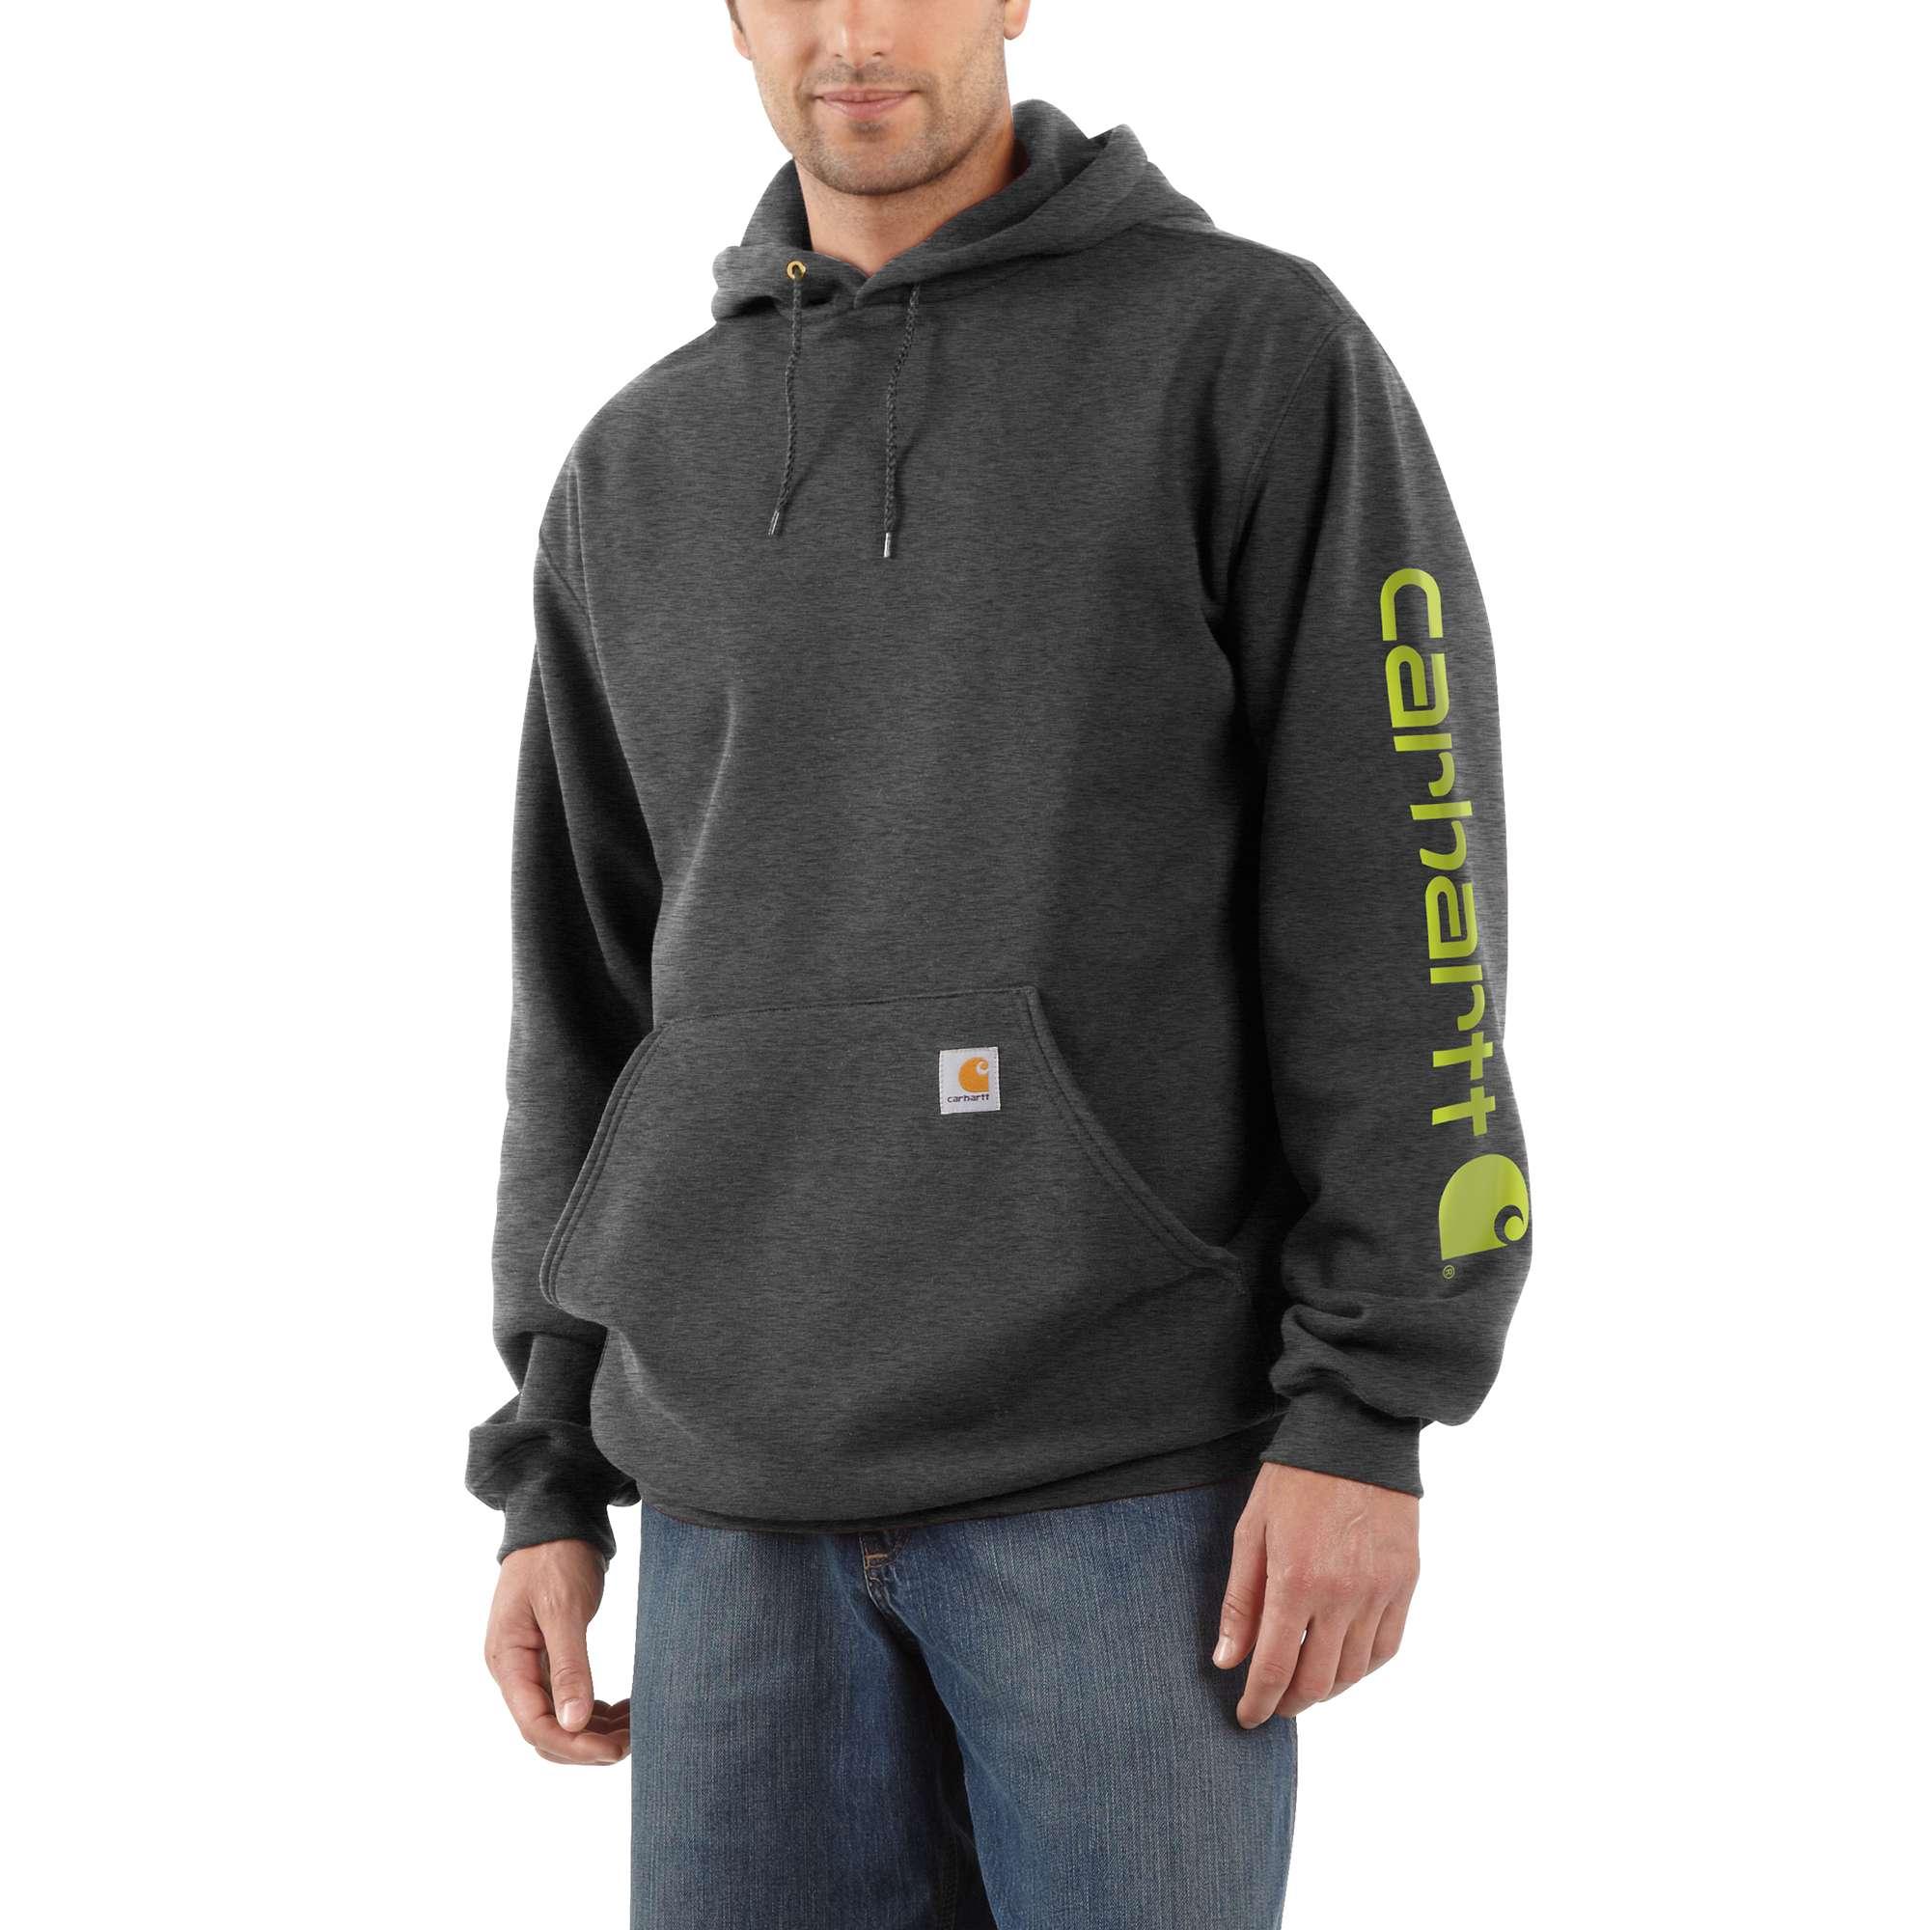 Men's Signature Sleeve Logo Hooded Sweatshirt, Heather Gray, swatch